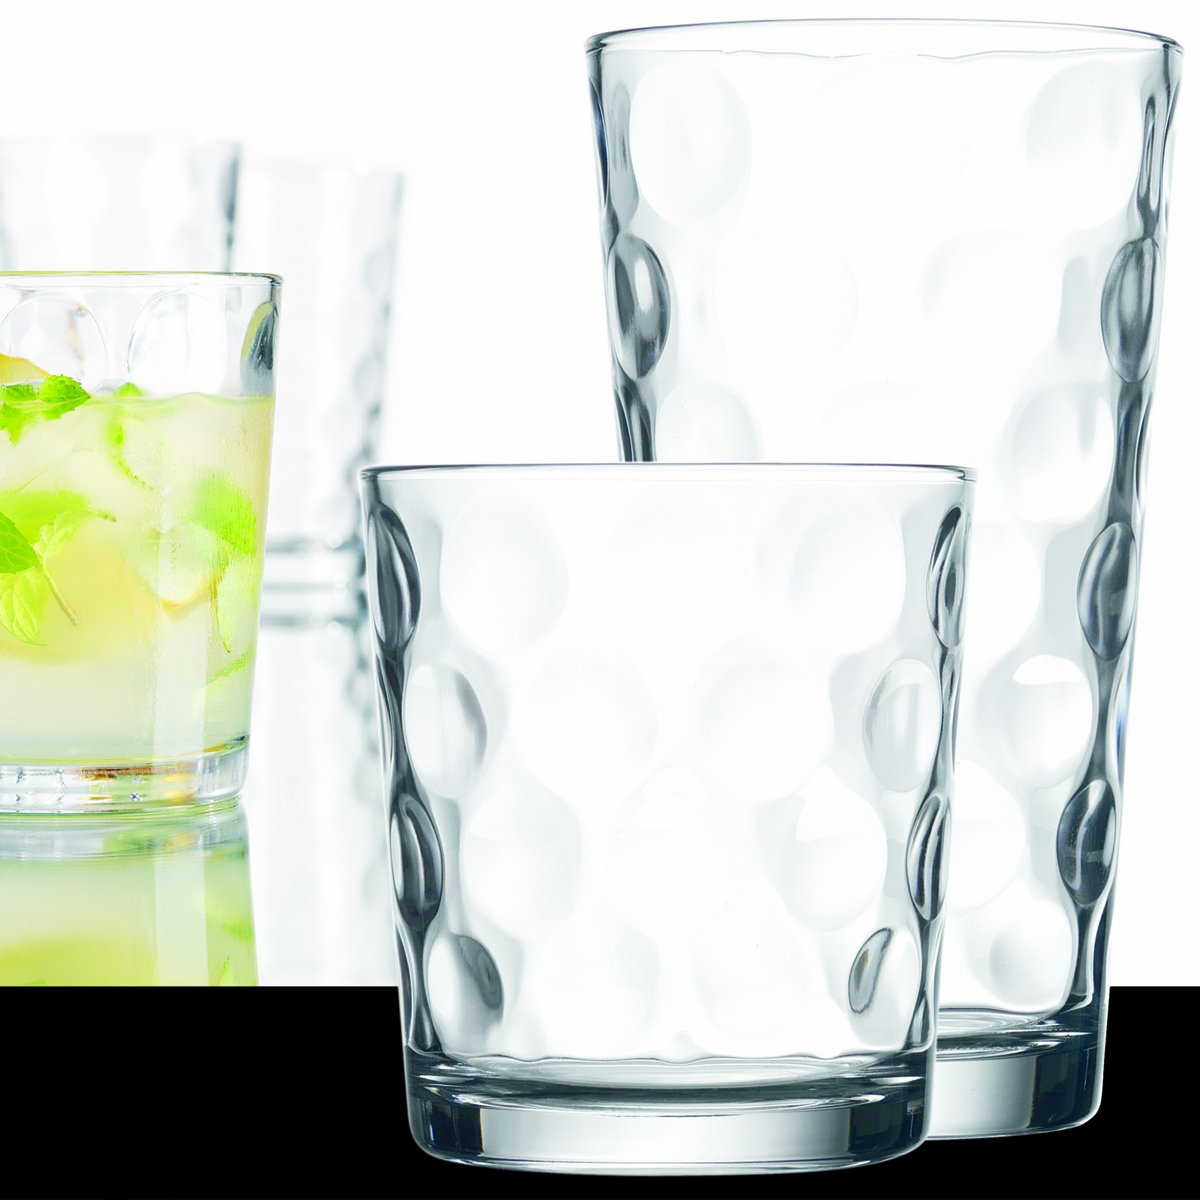 16-piece Elegant Eclipse Glassware Set - 8 Cooler Glasses and 8 DOF Glasses, Drinking Glasses Set of 16